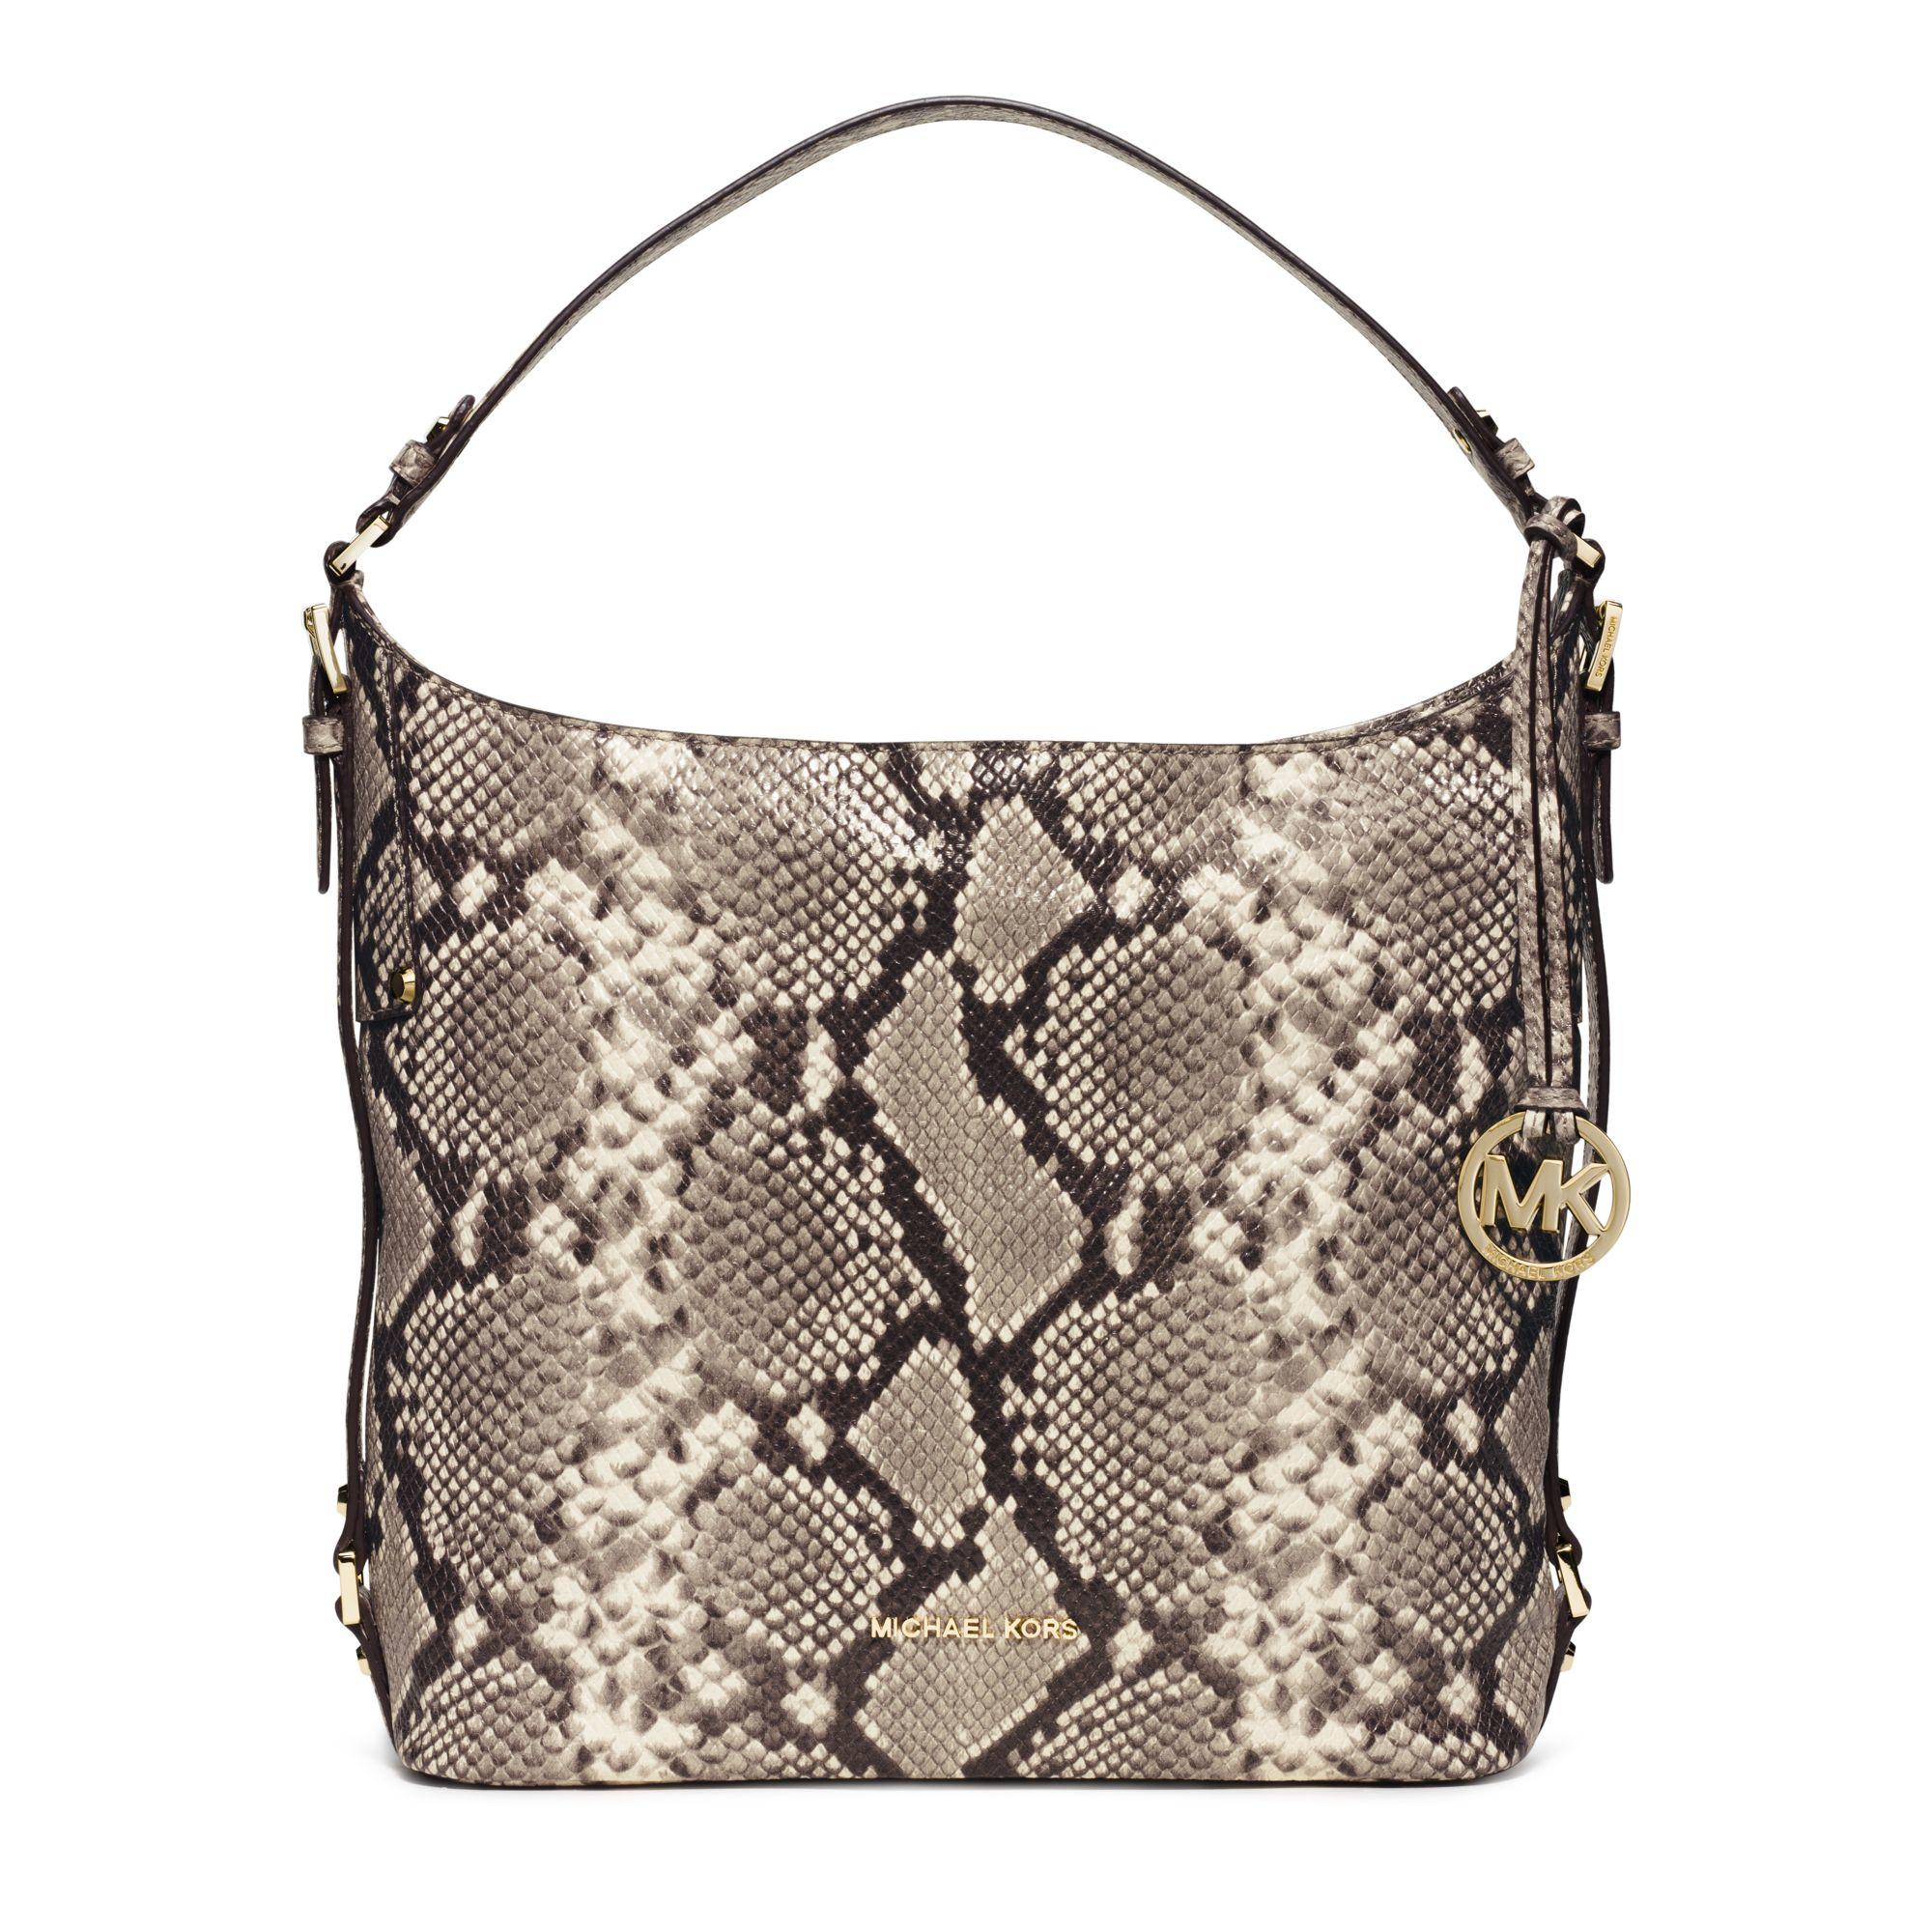 fe281a9f695e Lyst - Michael Kors Bedford Large Embossed-leather Shoulder Bag in ...